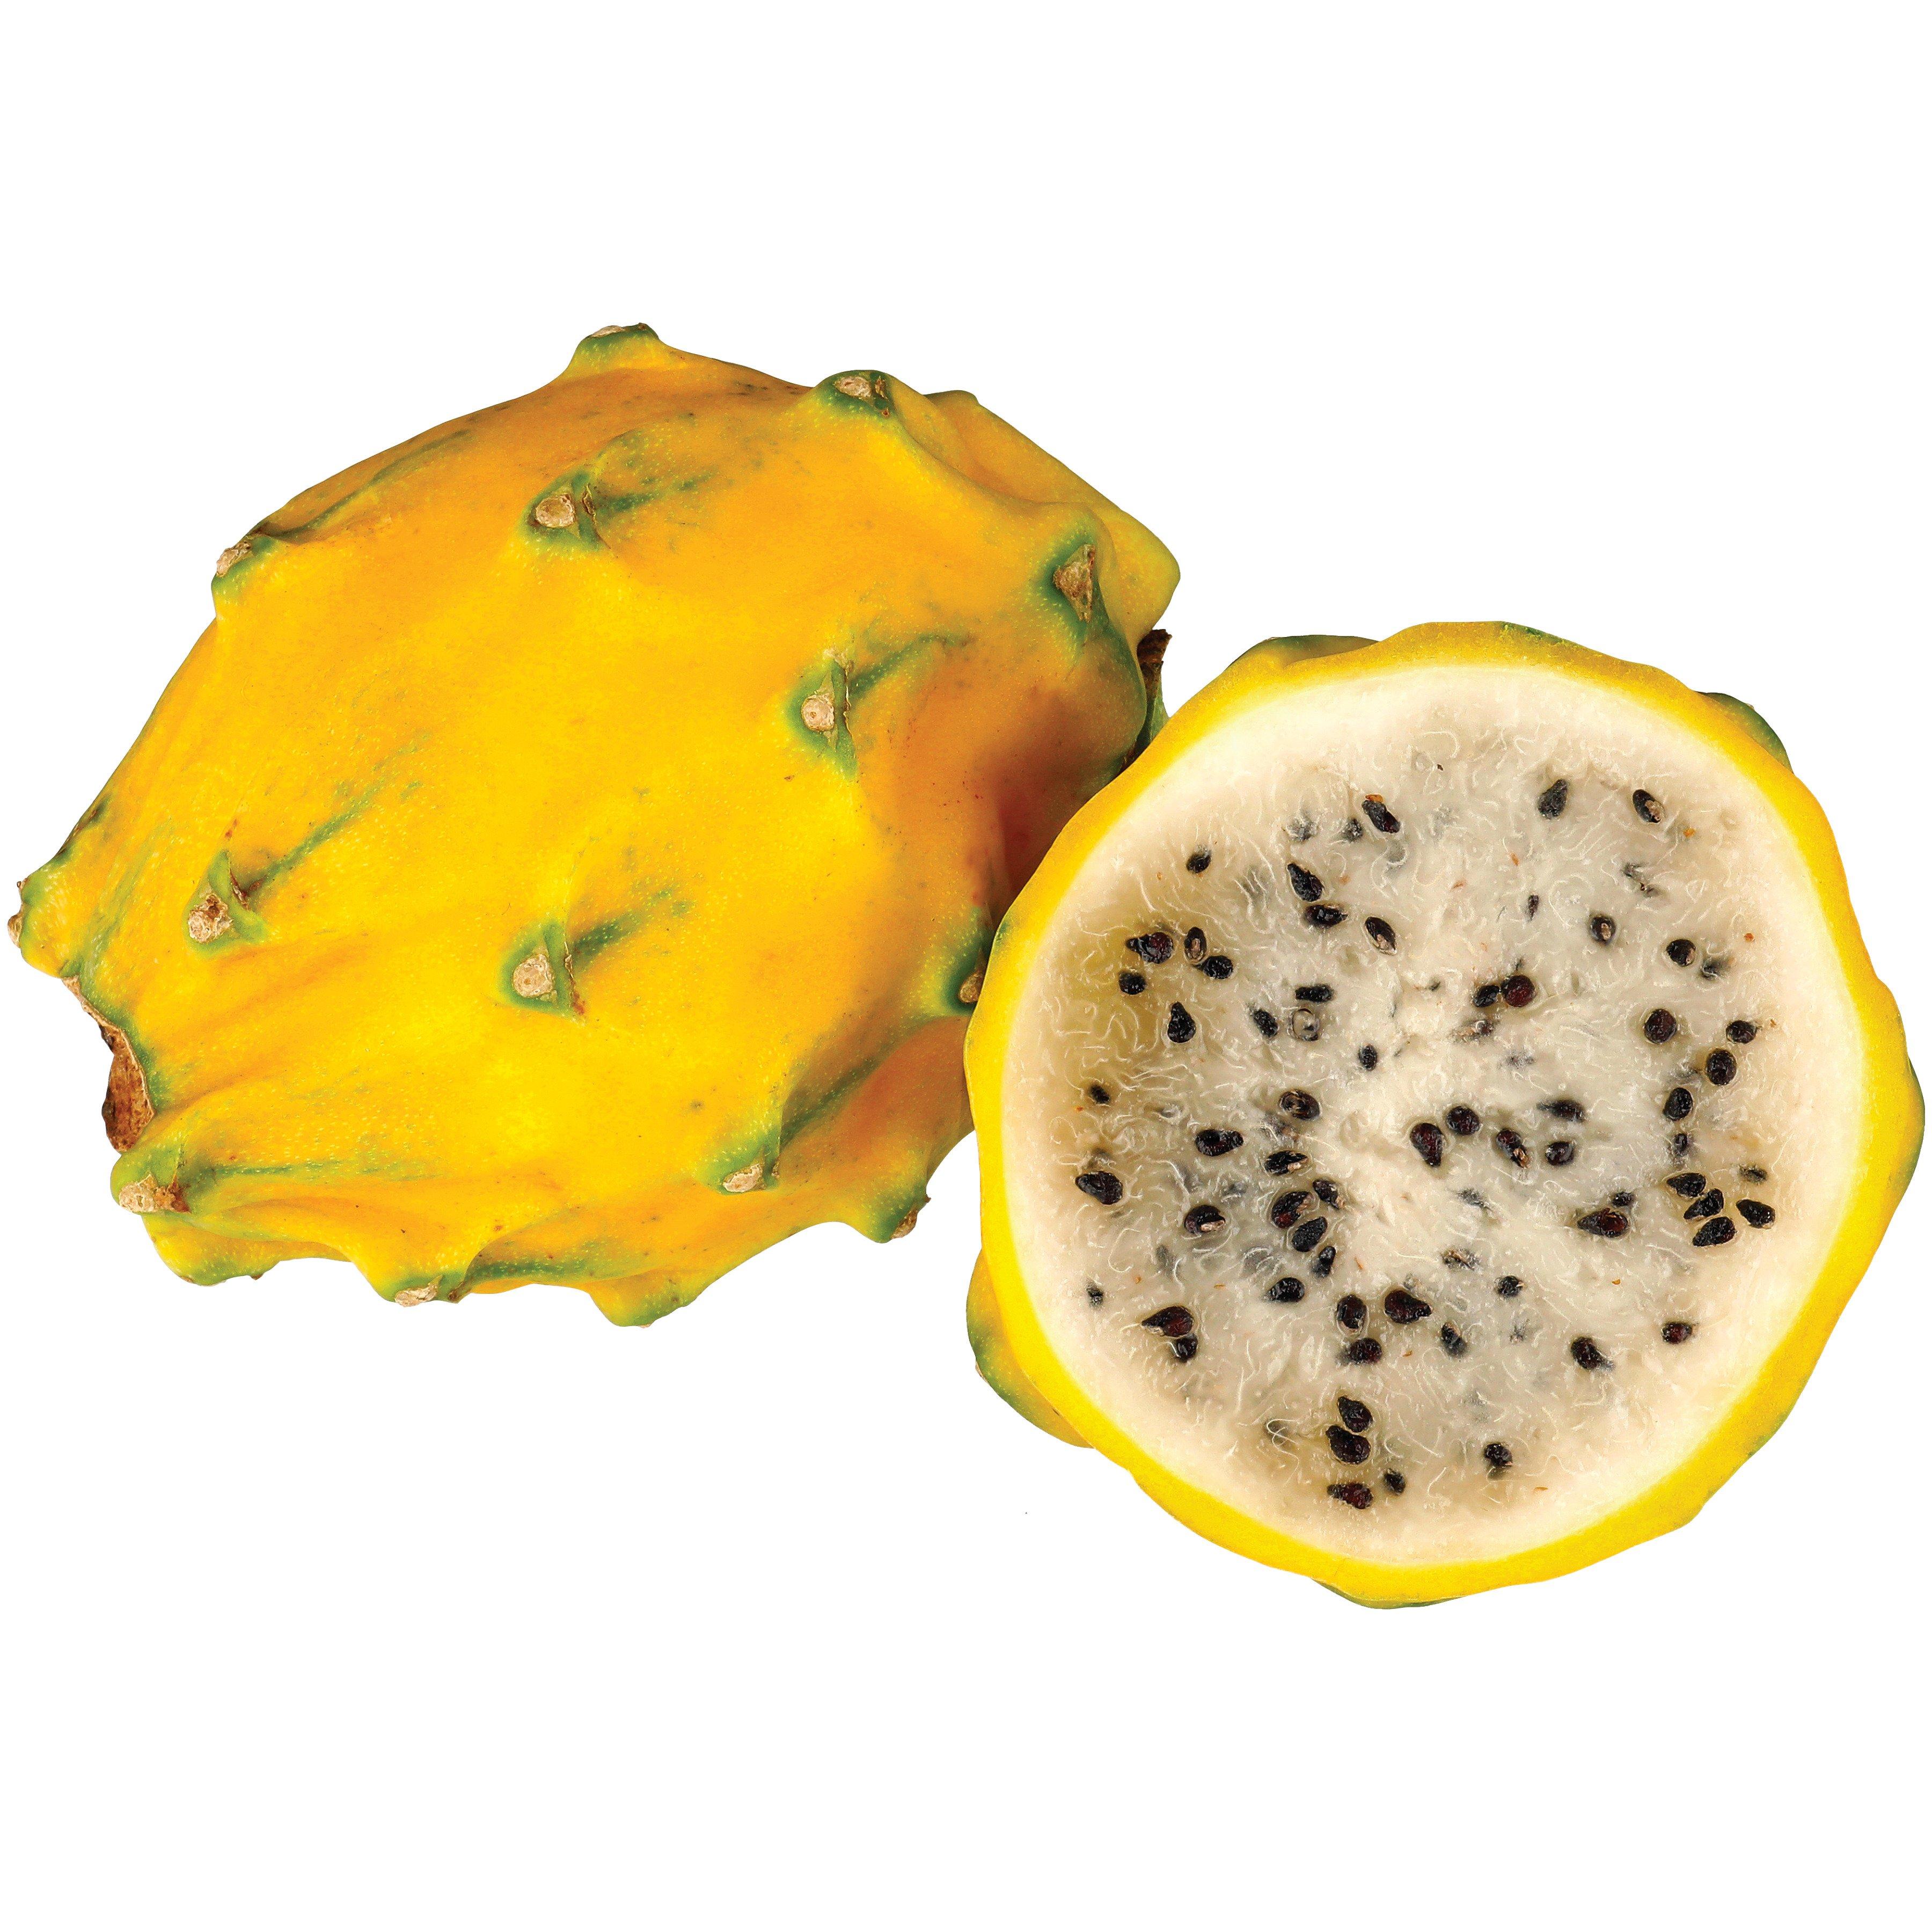 Golden dragon fruit price information on steroids